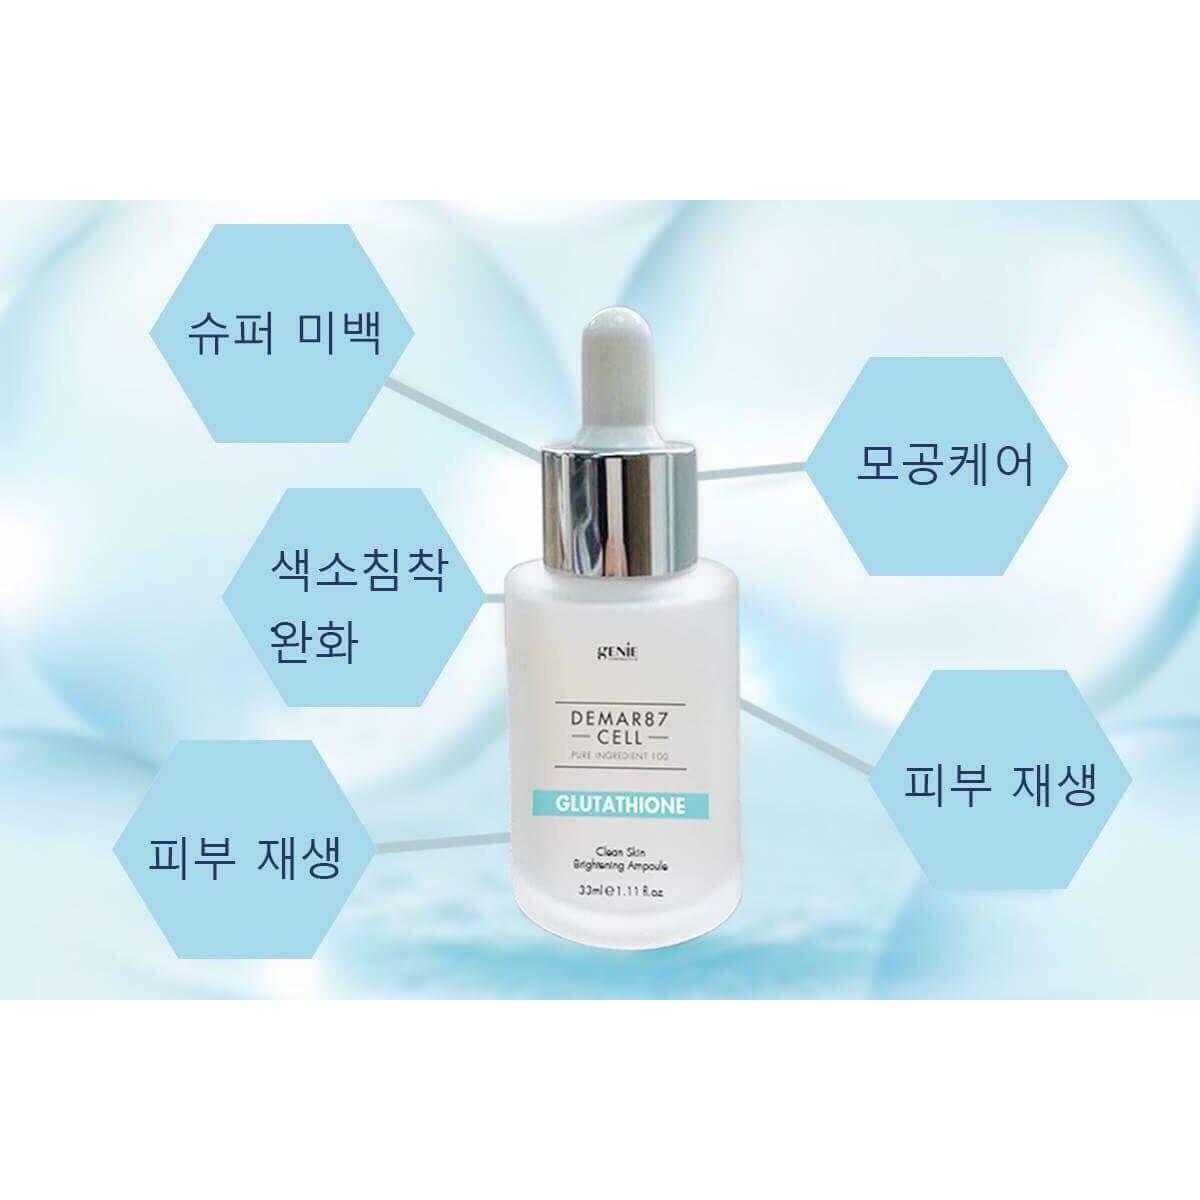 Serum truyền trắng da mờ thâm nám, sạm da, trẻ hóa da giúp da căng bóng sáng mịn Genie  Demar87 Cell Glutathione Korea 33ml